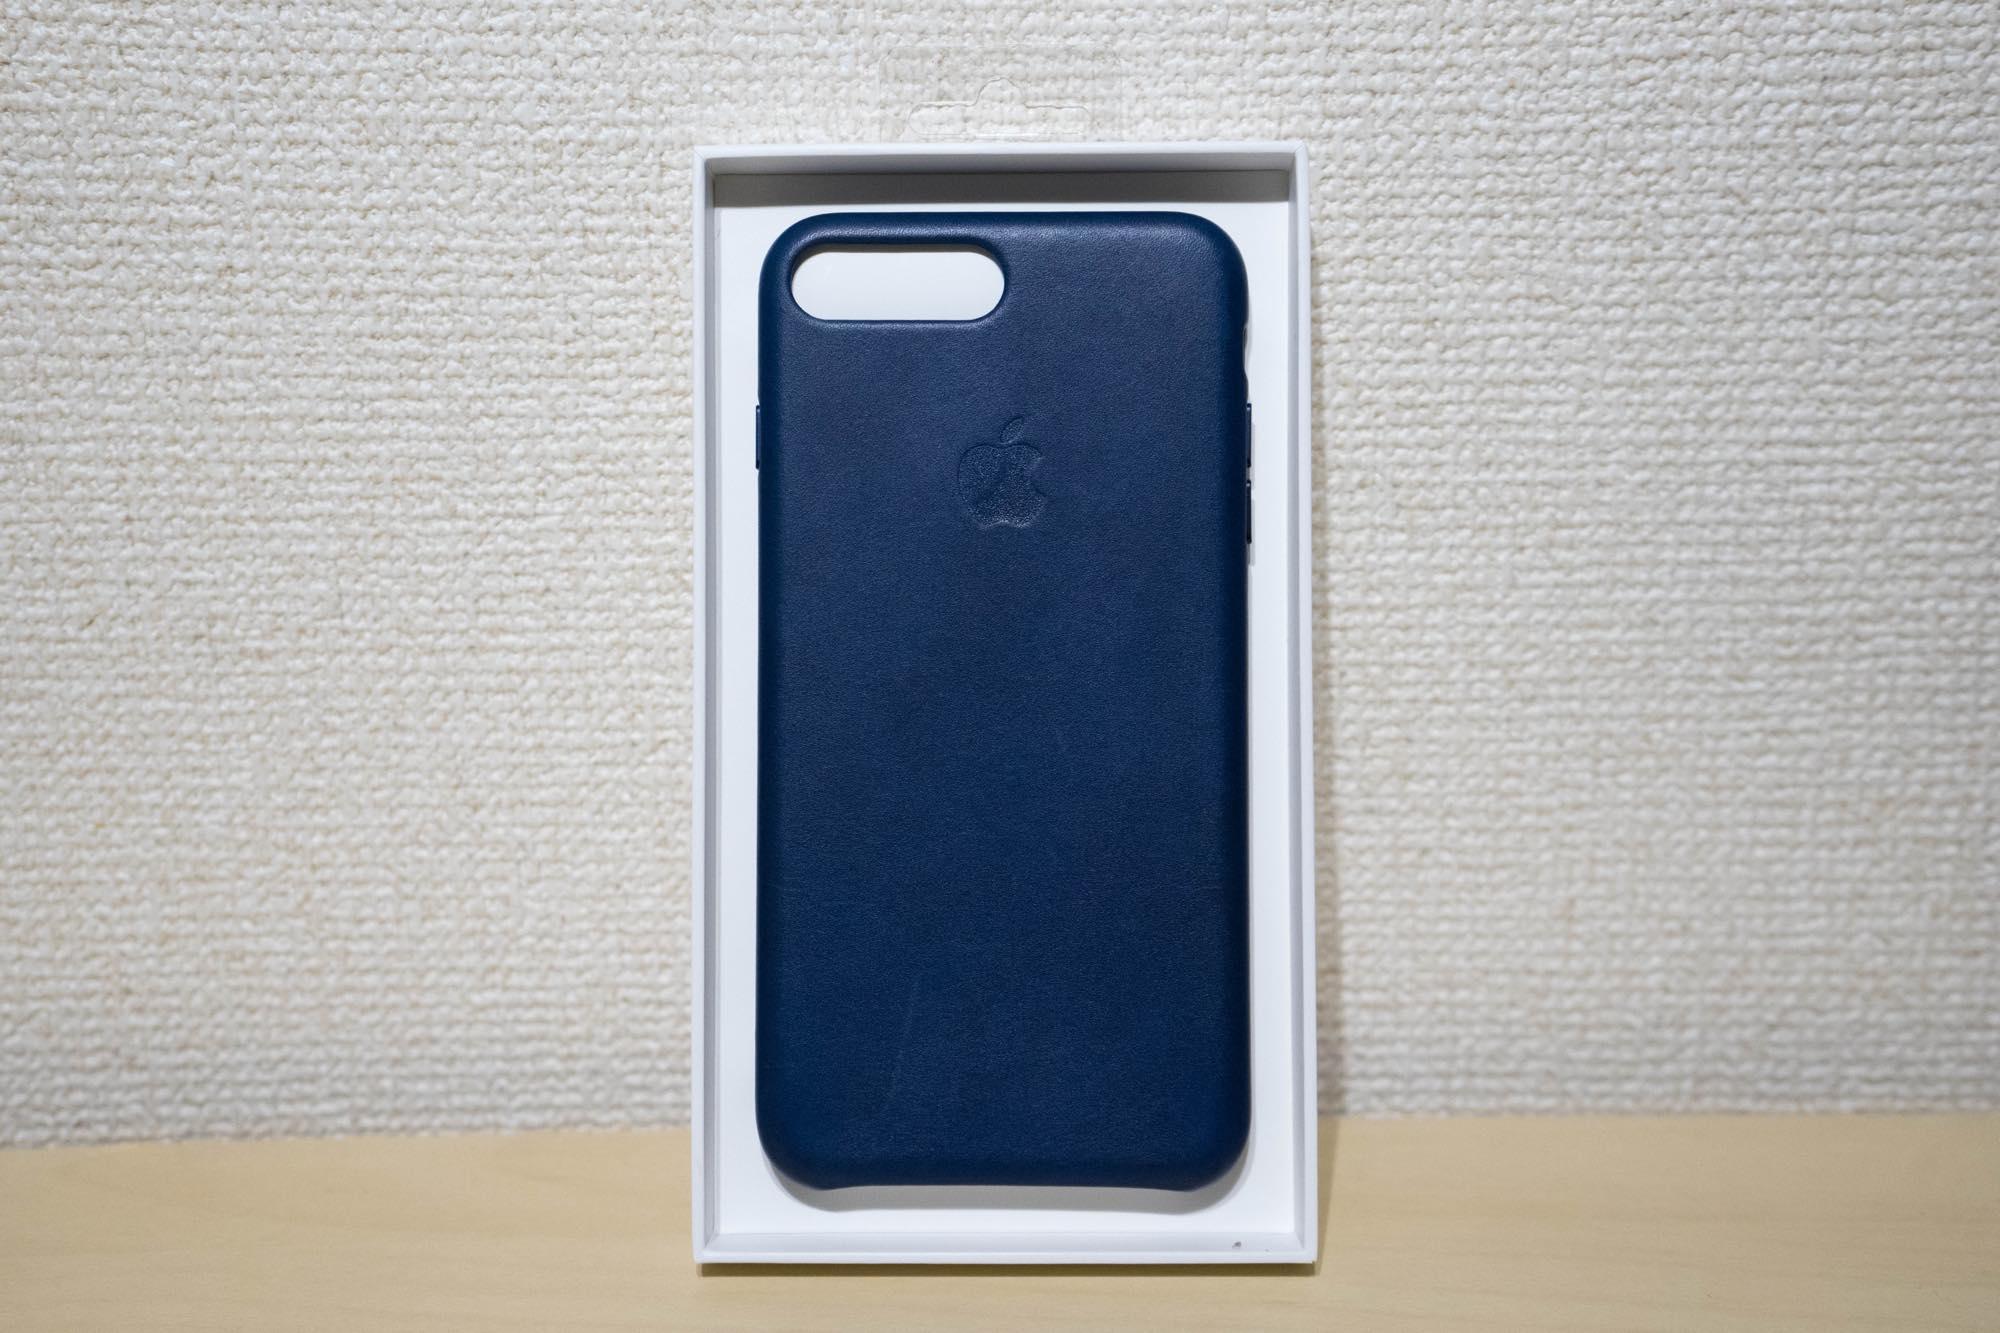 iphone7plus-leathercase-midnightblue2